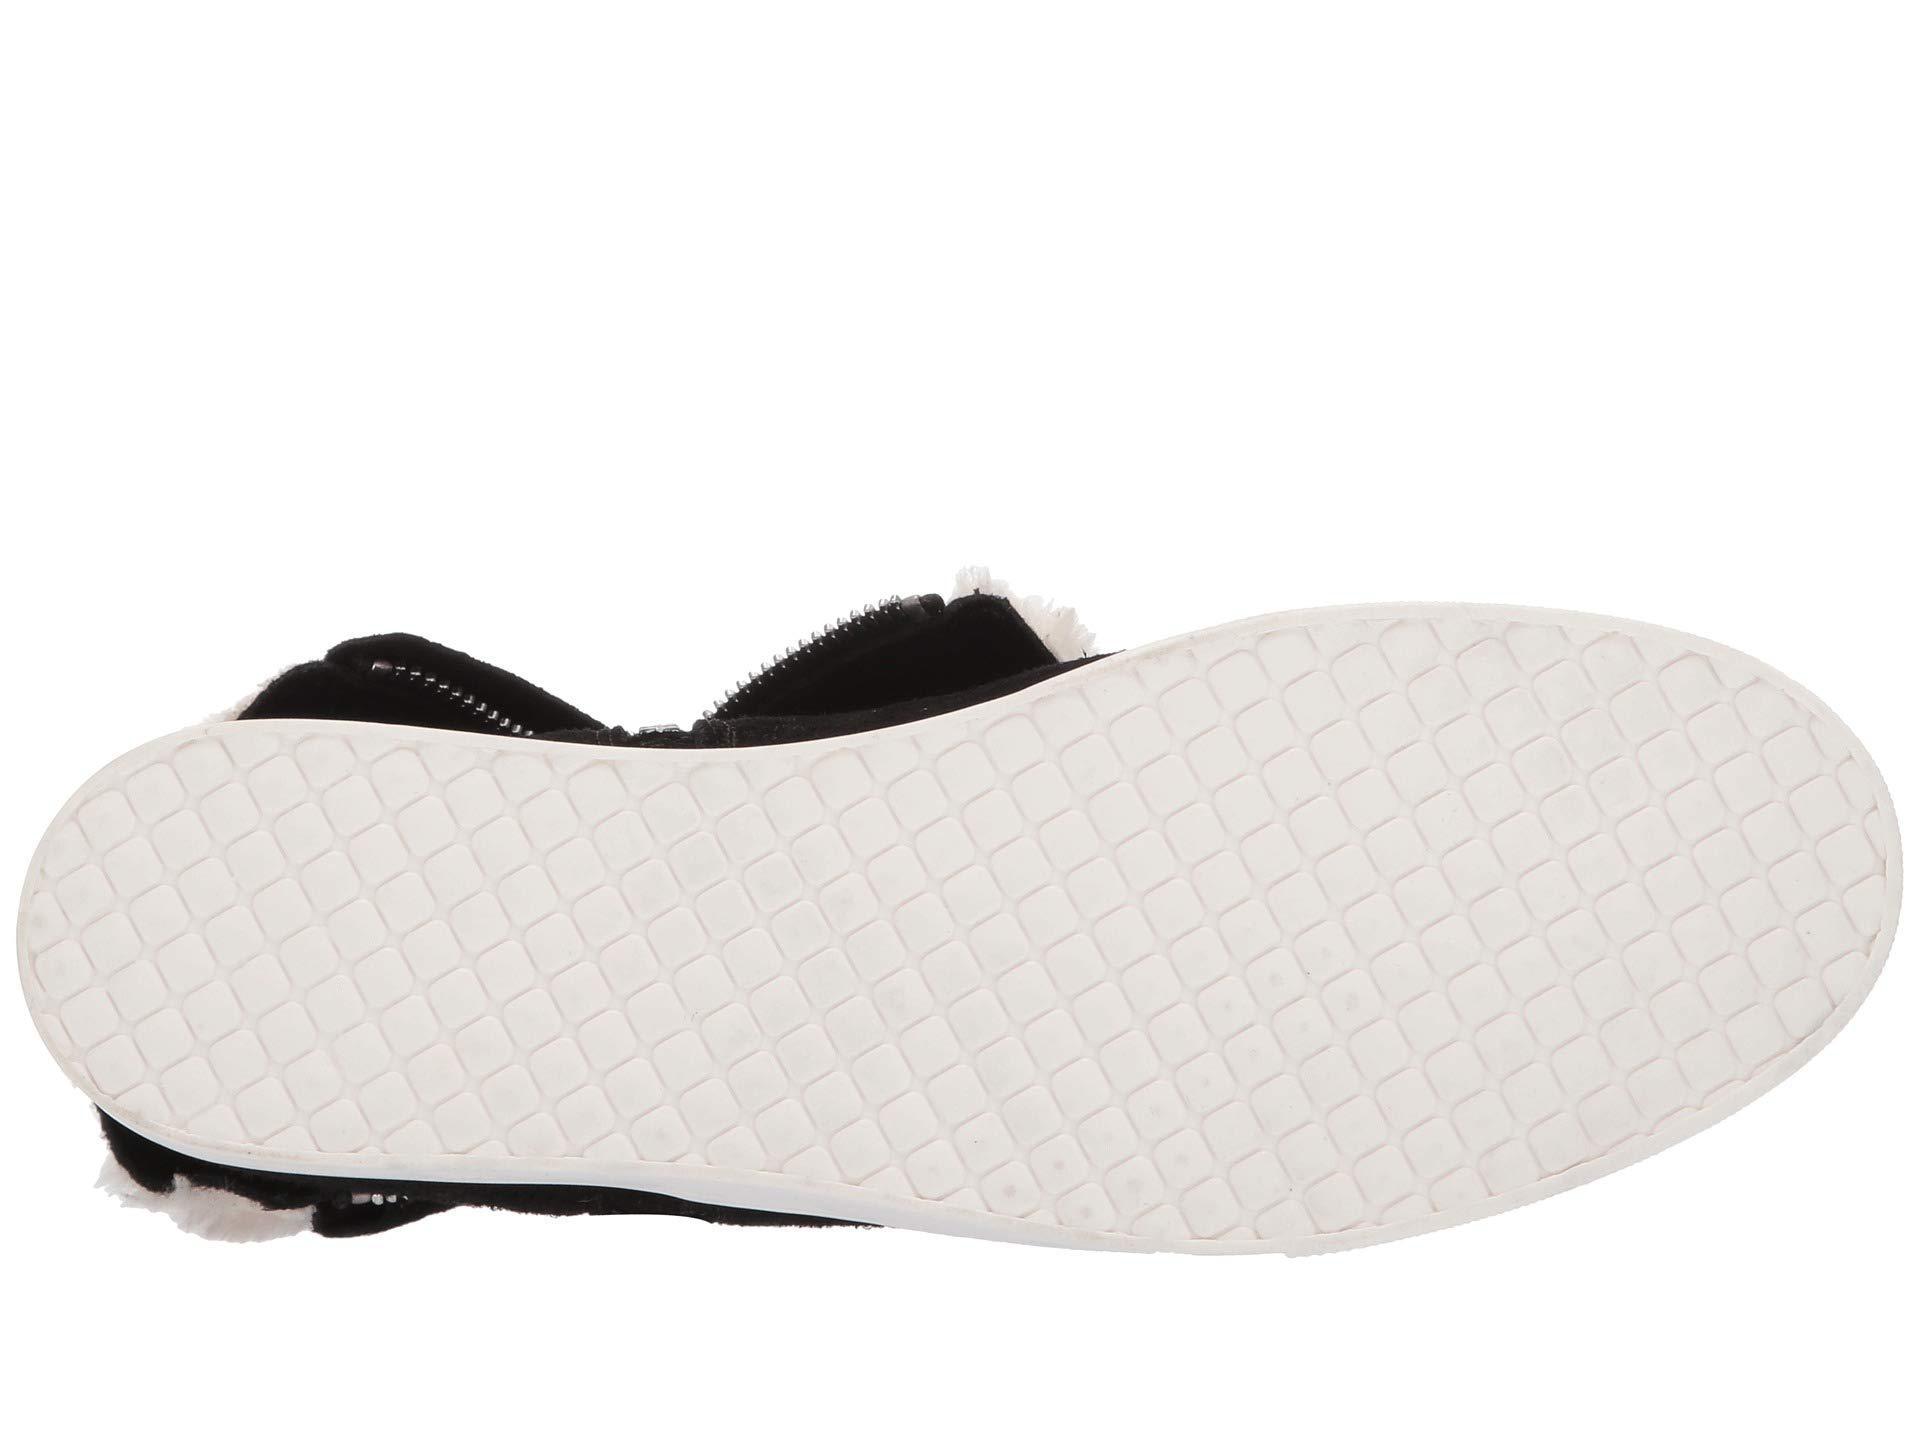 9b8befbdb11 Steve Madden - Wanda Wedge Sneaker (black Suede) Women s Wedge Shoes -  Lyst. View fullscreen